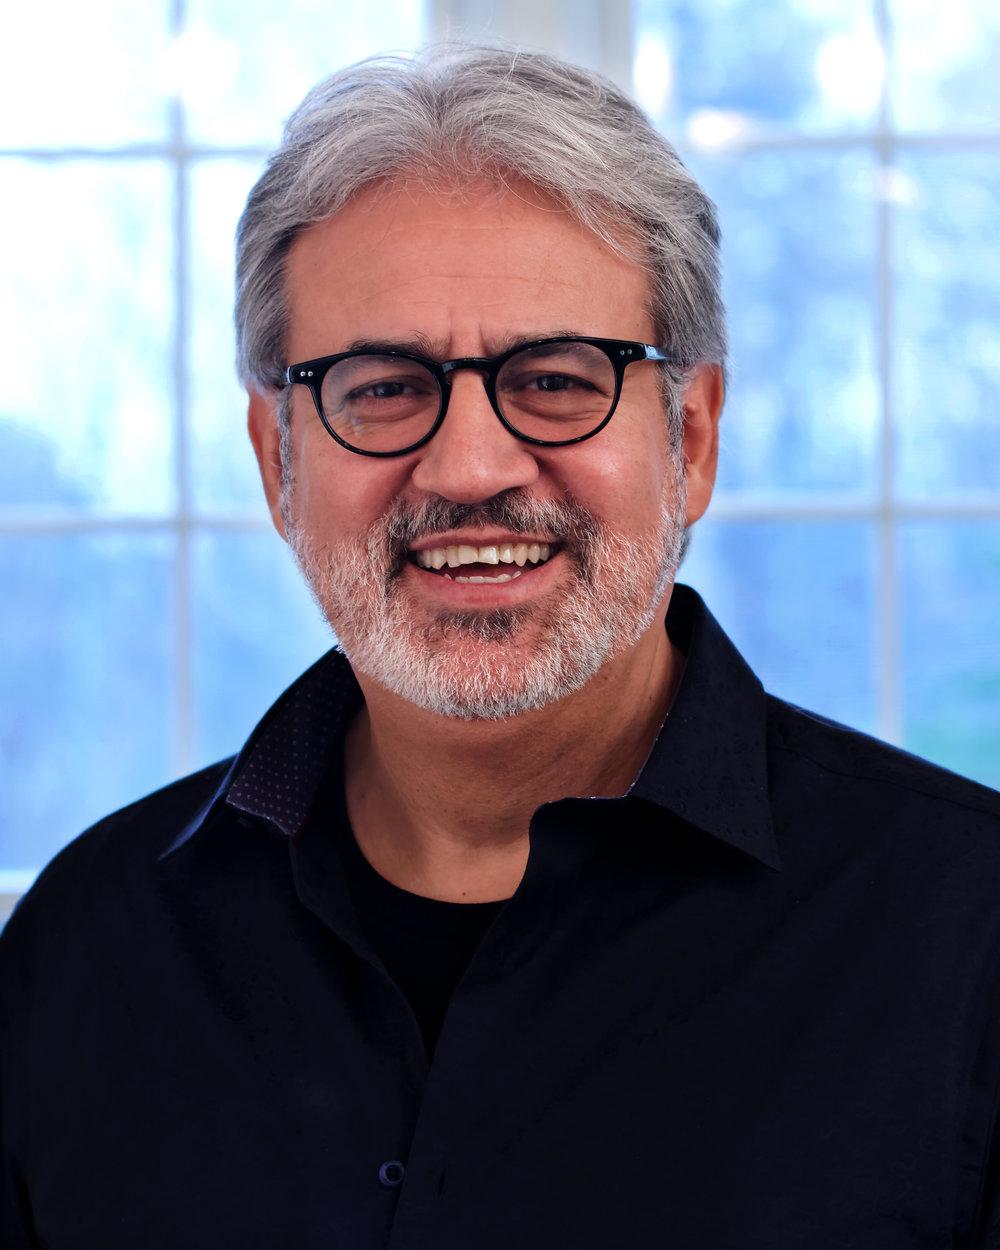 David E. Ramirez - 3rd Assistant Overseer